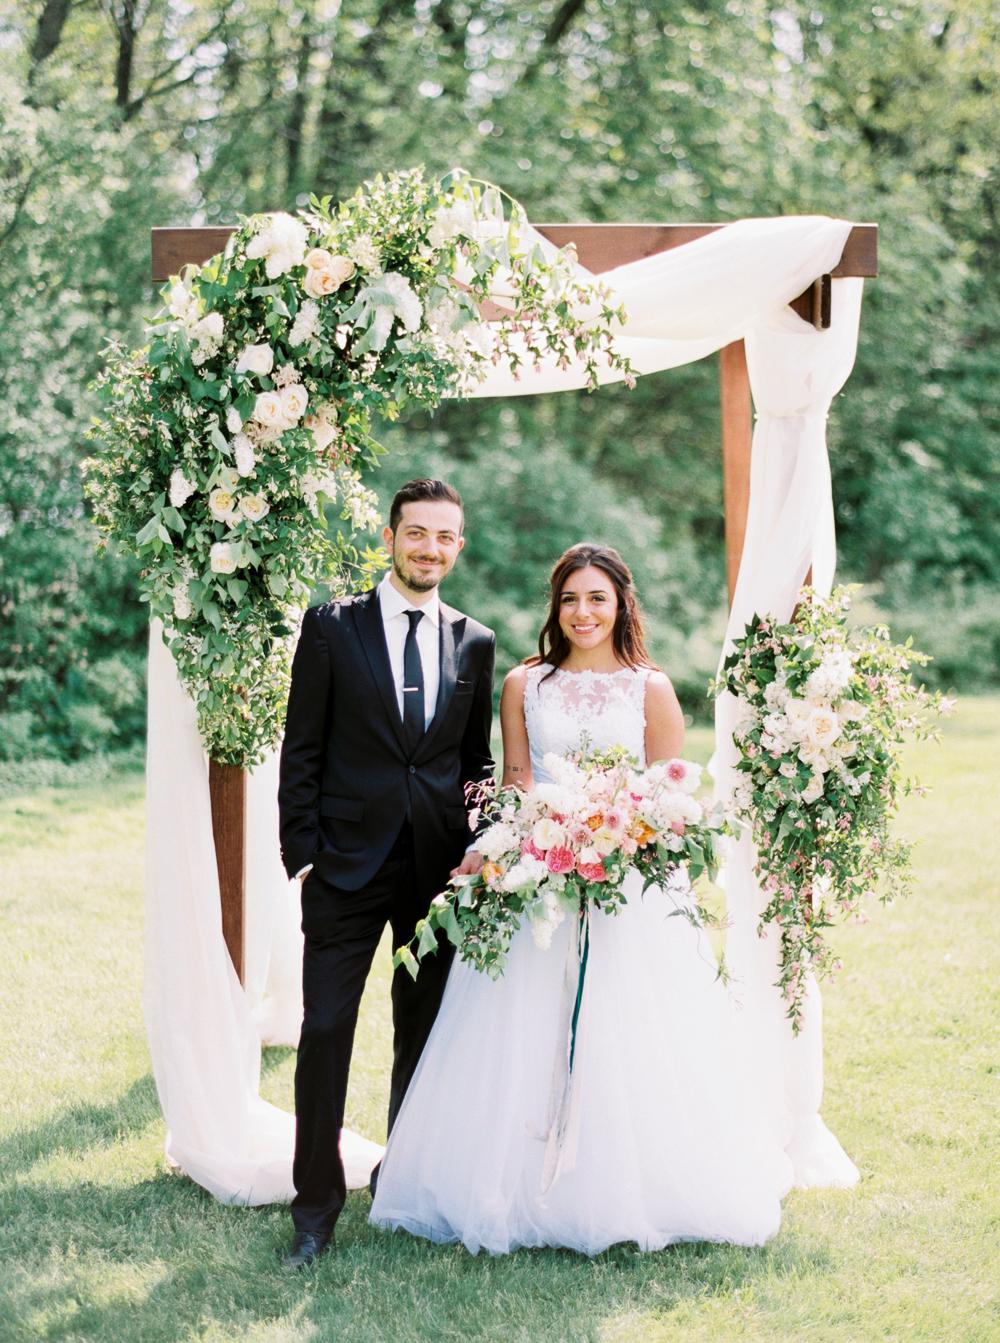 Intimate Flamborough Hills Wedding Inspiration - photo by Andrew Mark https://ruffledblog.com/intimate-flamborough-hills-wedding-inspiration